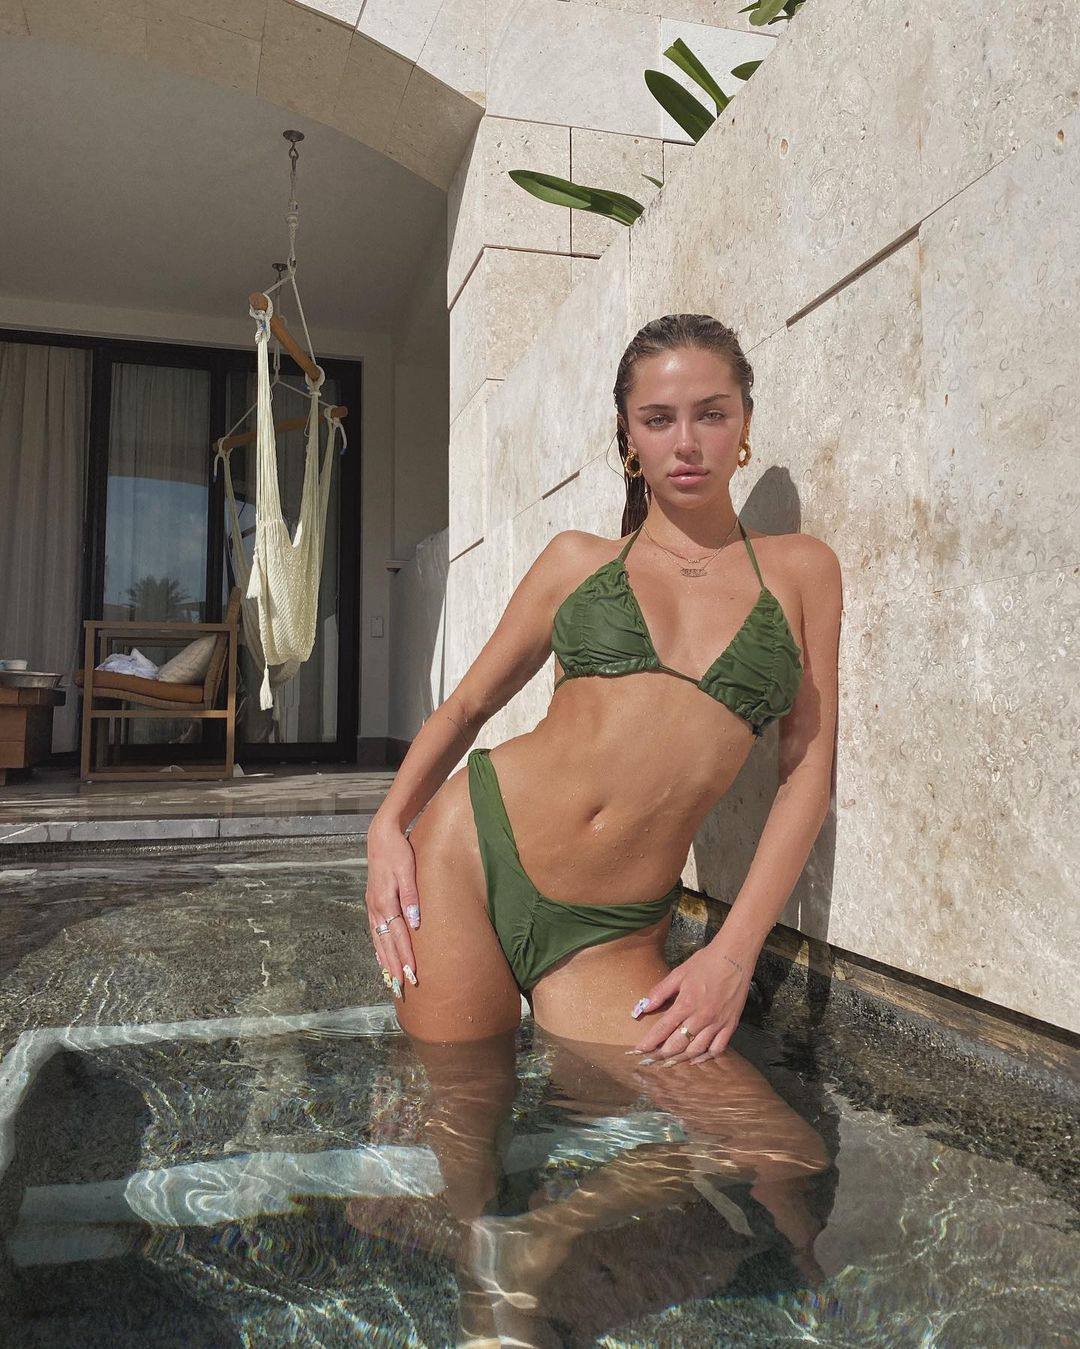 Delilah Belle Hamlin Sexy In Bikini